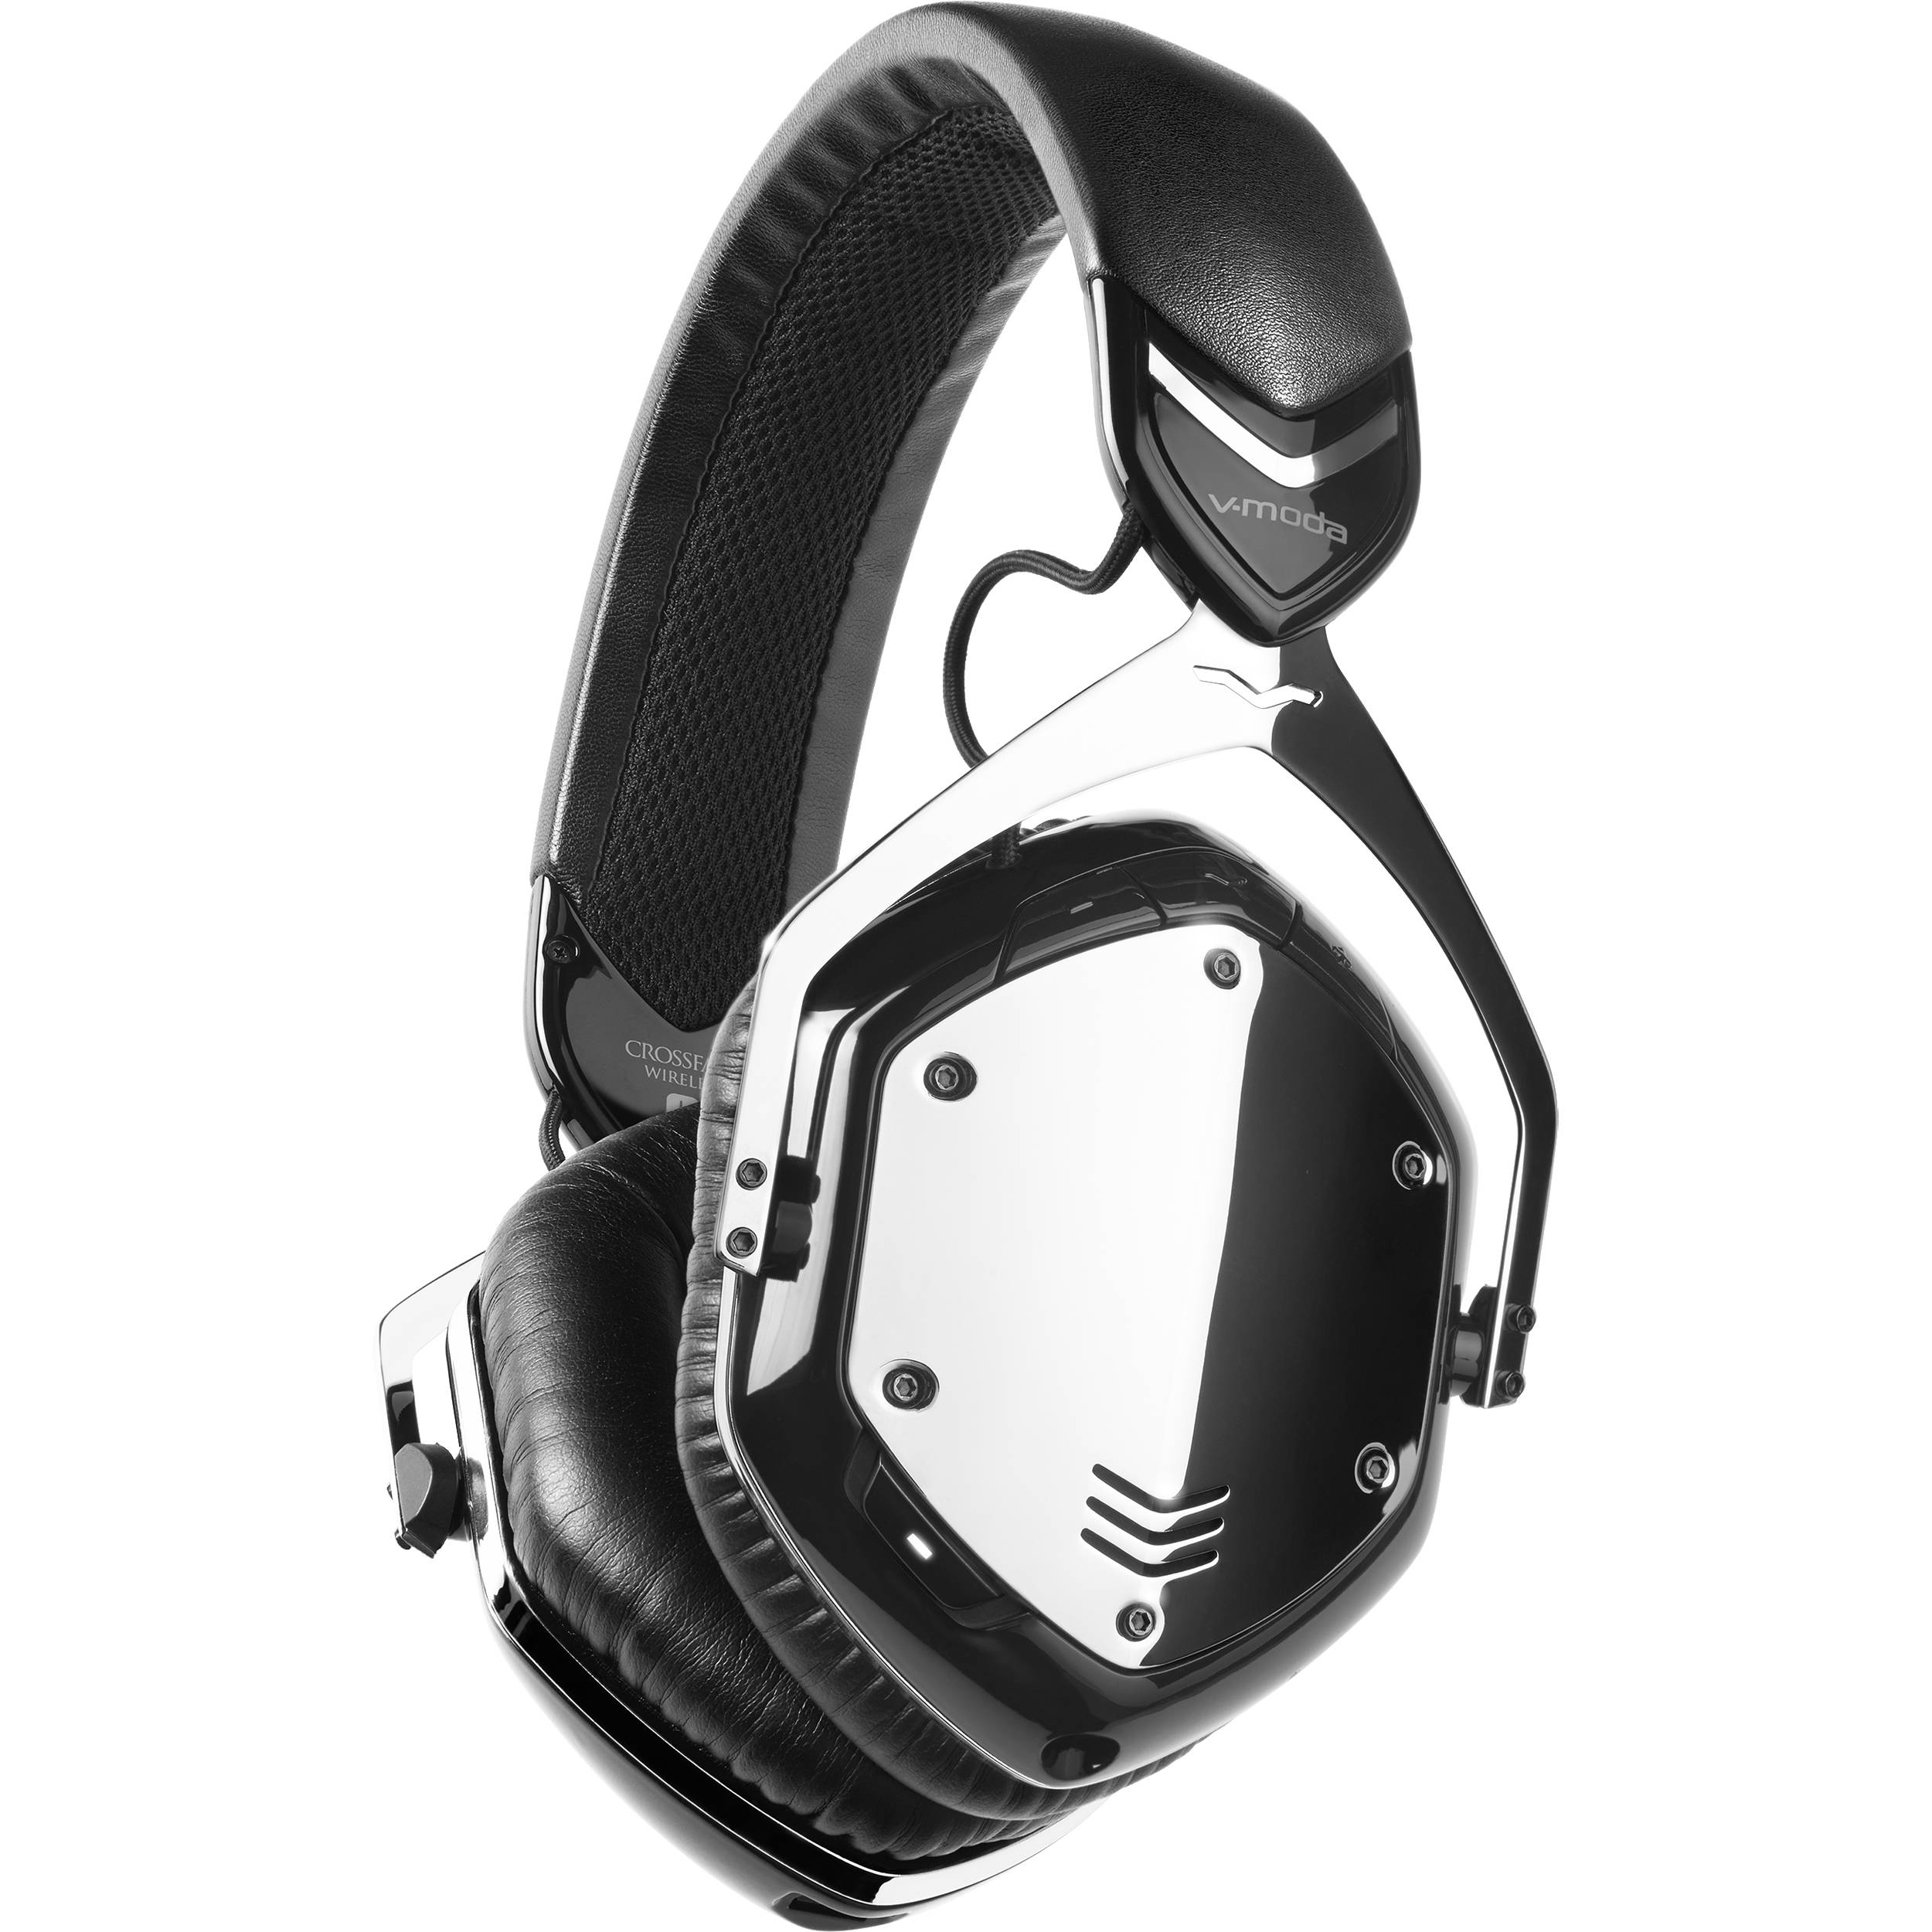 Marley headphones wireless - vmoda wireless headphones